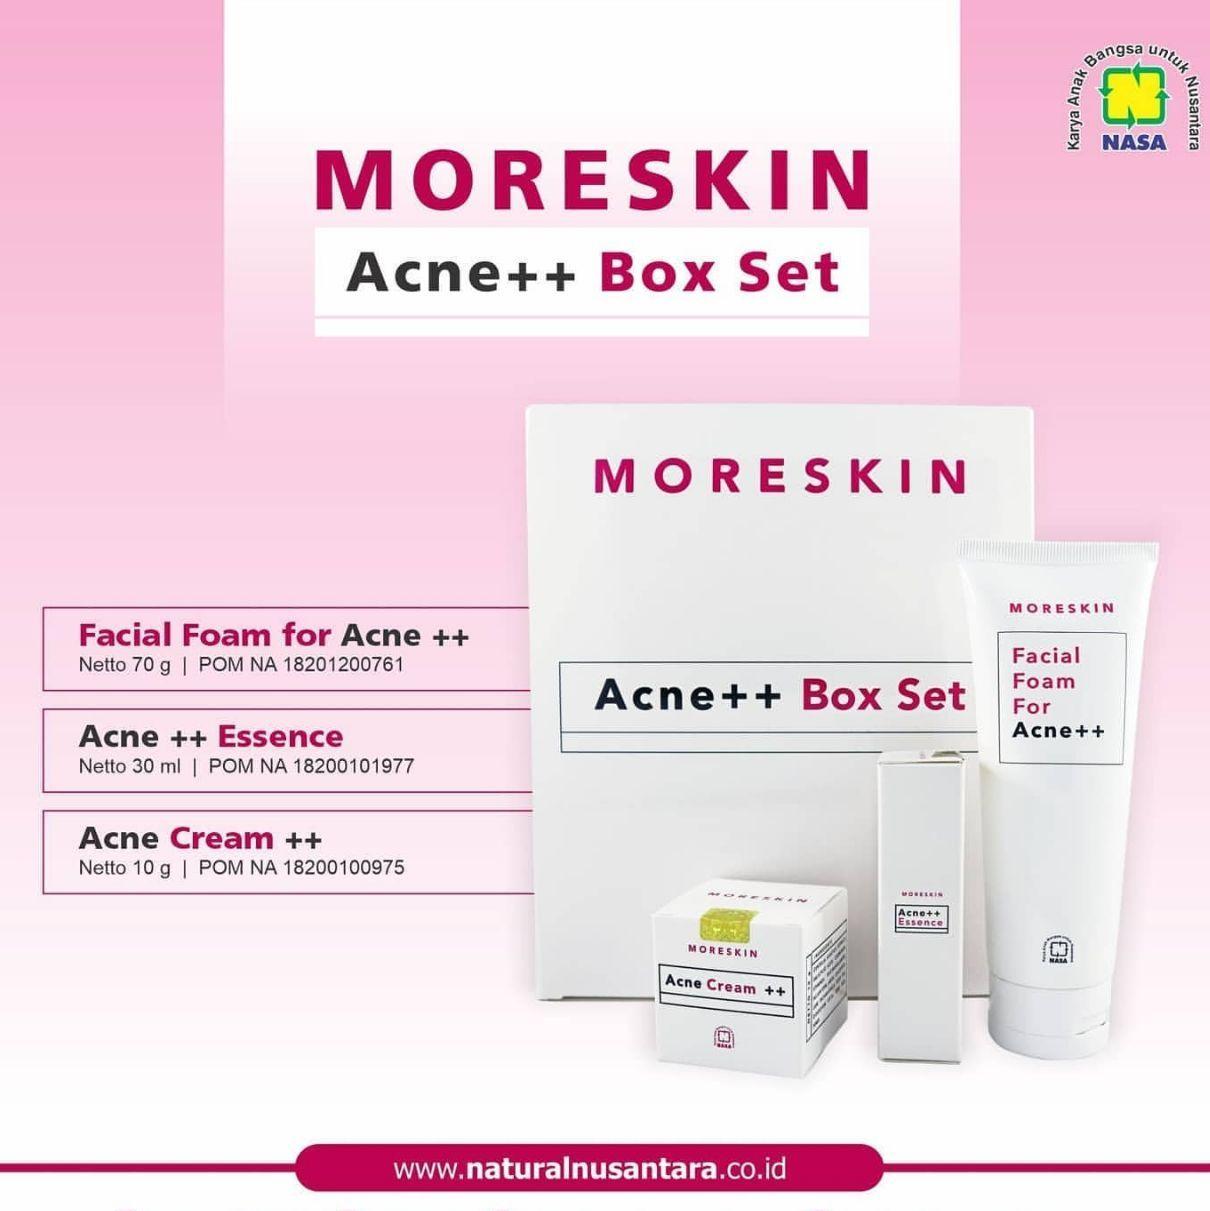 Moreskin Acne Series Nasa